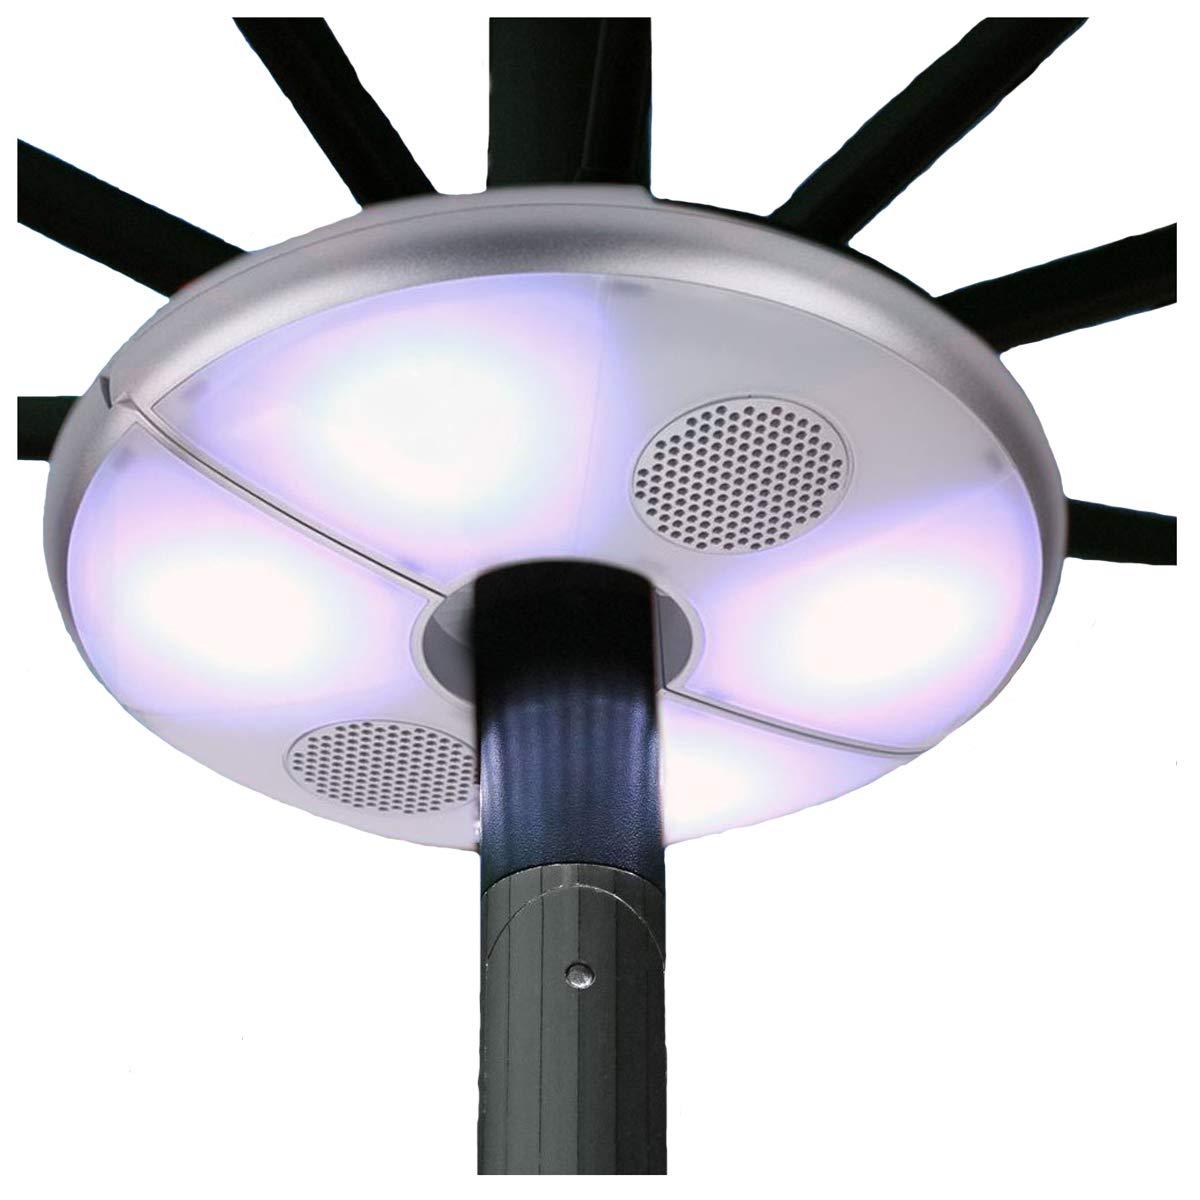 Gazebo Parasol Lights Outdoor Sun Beach Patio Umbrella Led Light Bluetooth Wireless Speakers 2in1 Stereo Speaker Waterproof Rechargeable Buy Online In Dominica At Dominica Desertcart Com Productid 53297429